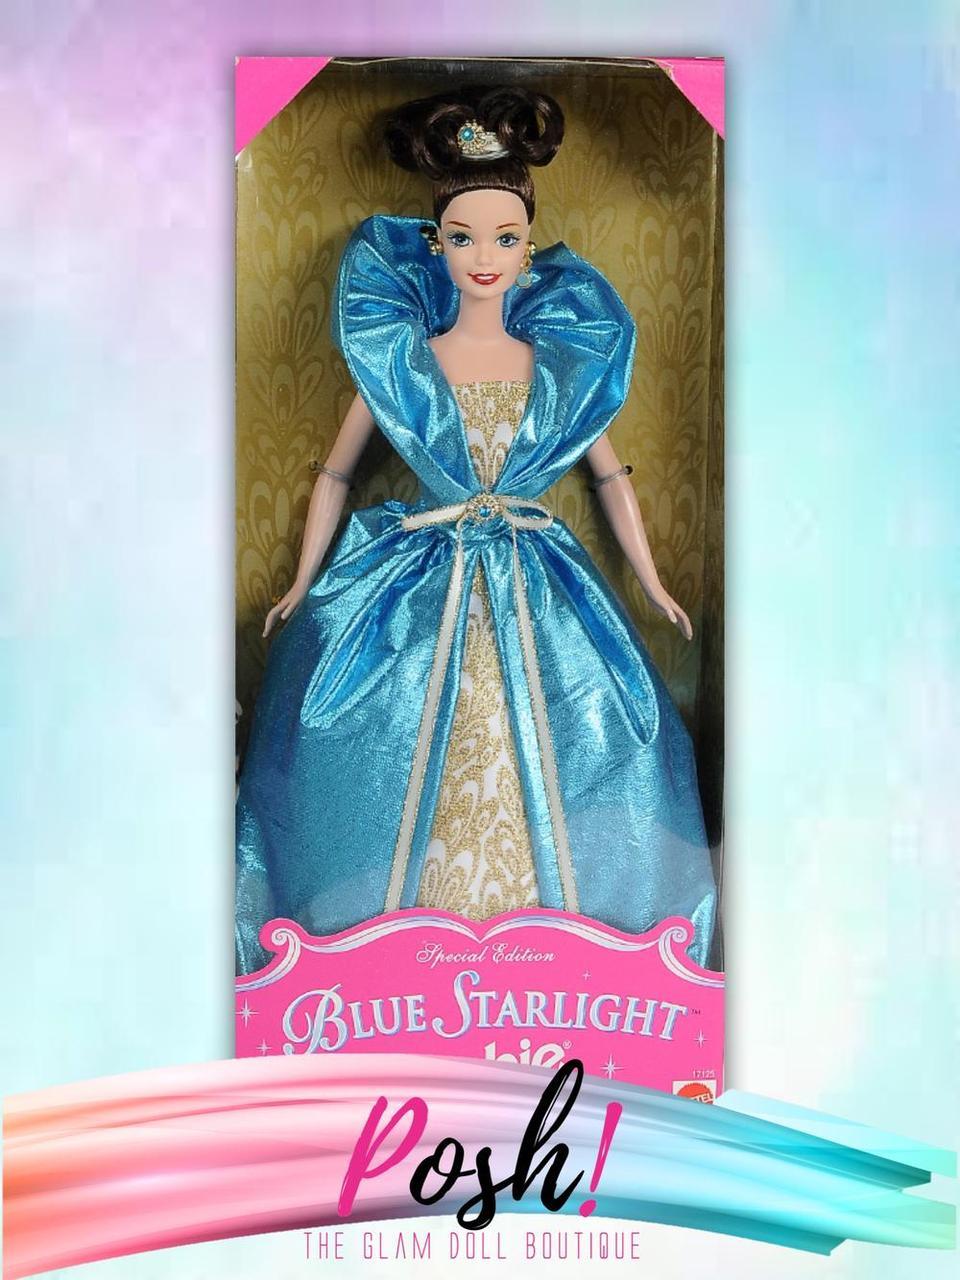 Колекційна лялька Барбі / Barbie Sears Special Edition Blue Starlight (1997 р.)